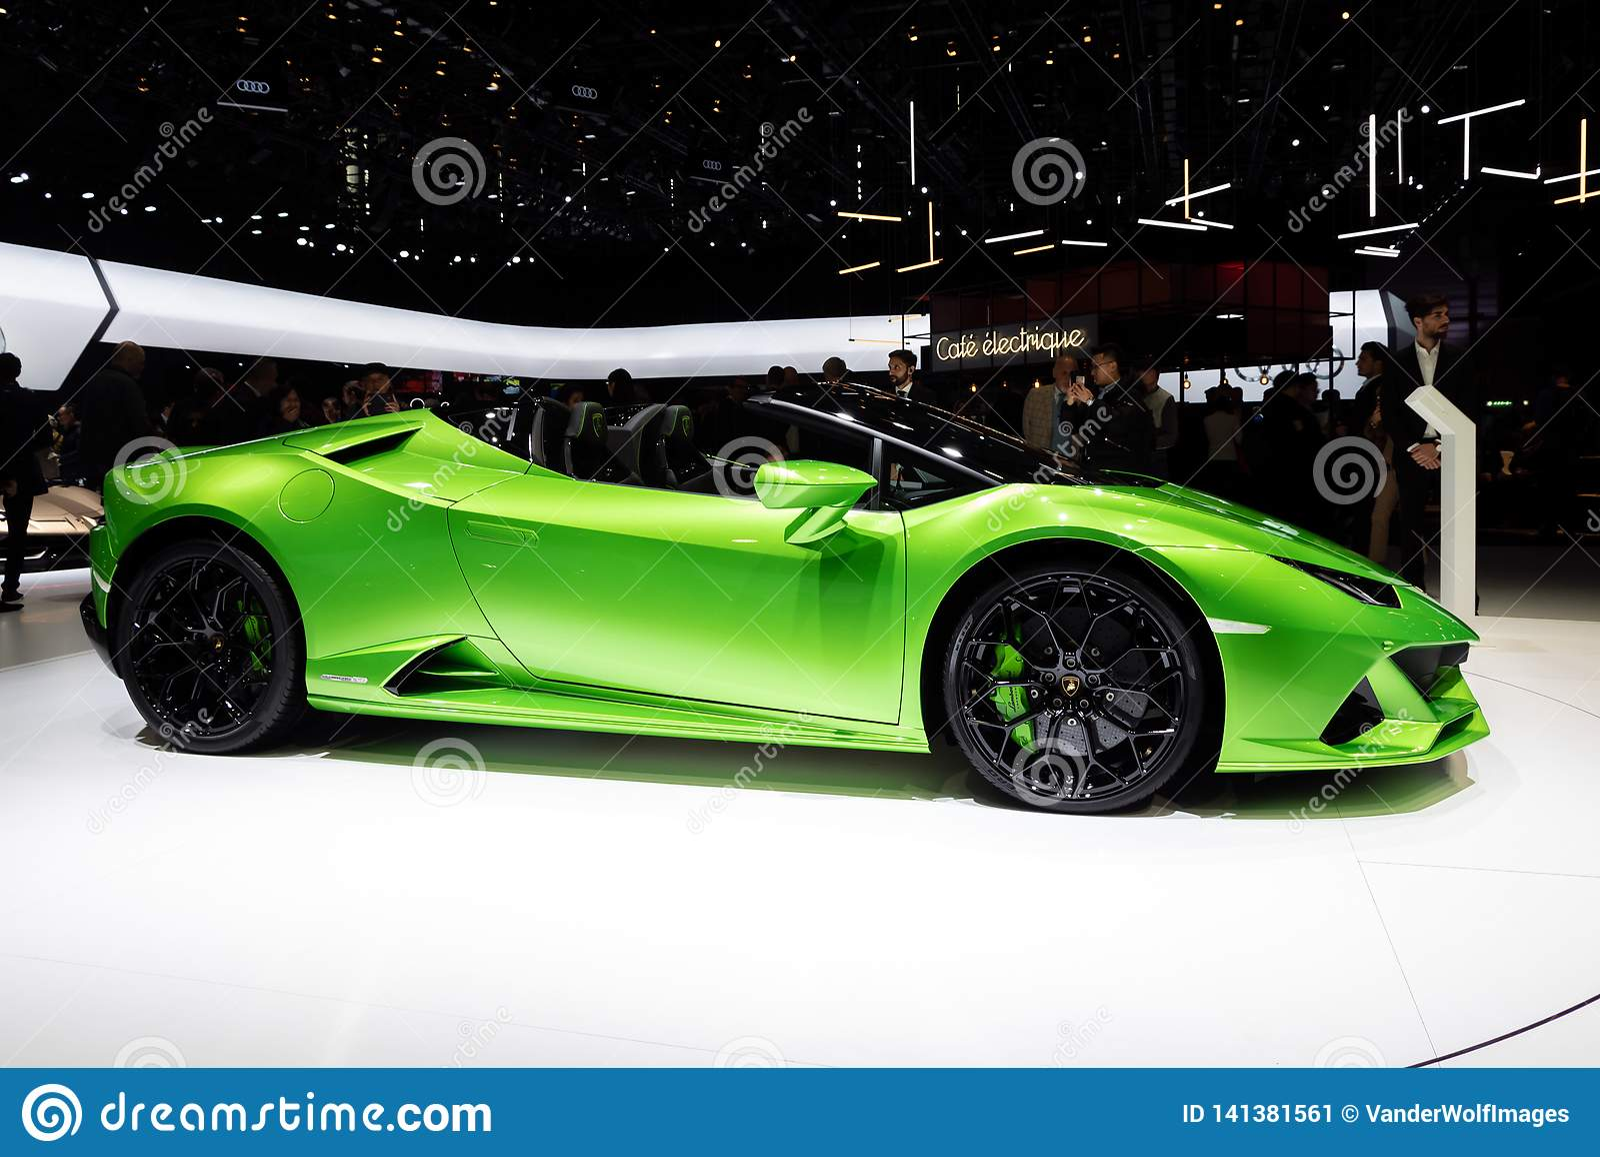 New 2019 Lamborghini Huracan Evo Spyder Supercar Editorial Photo